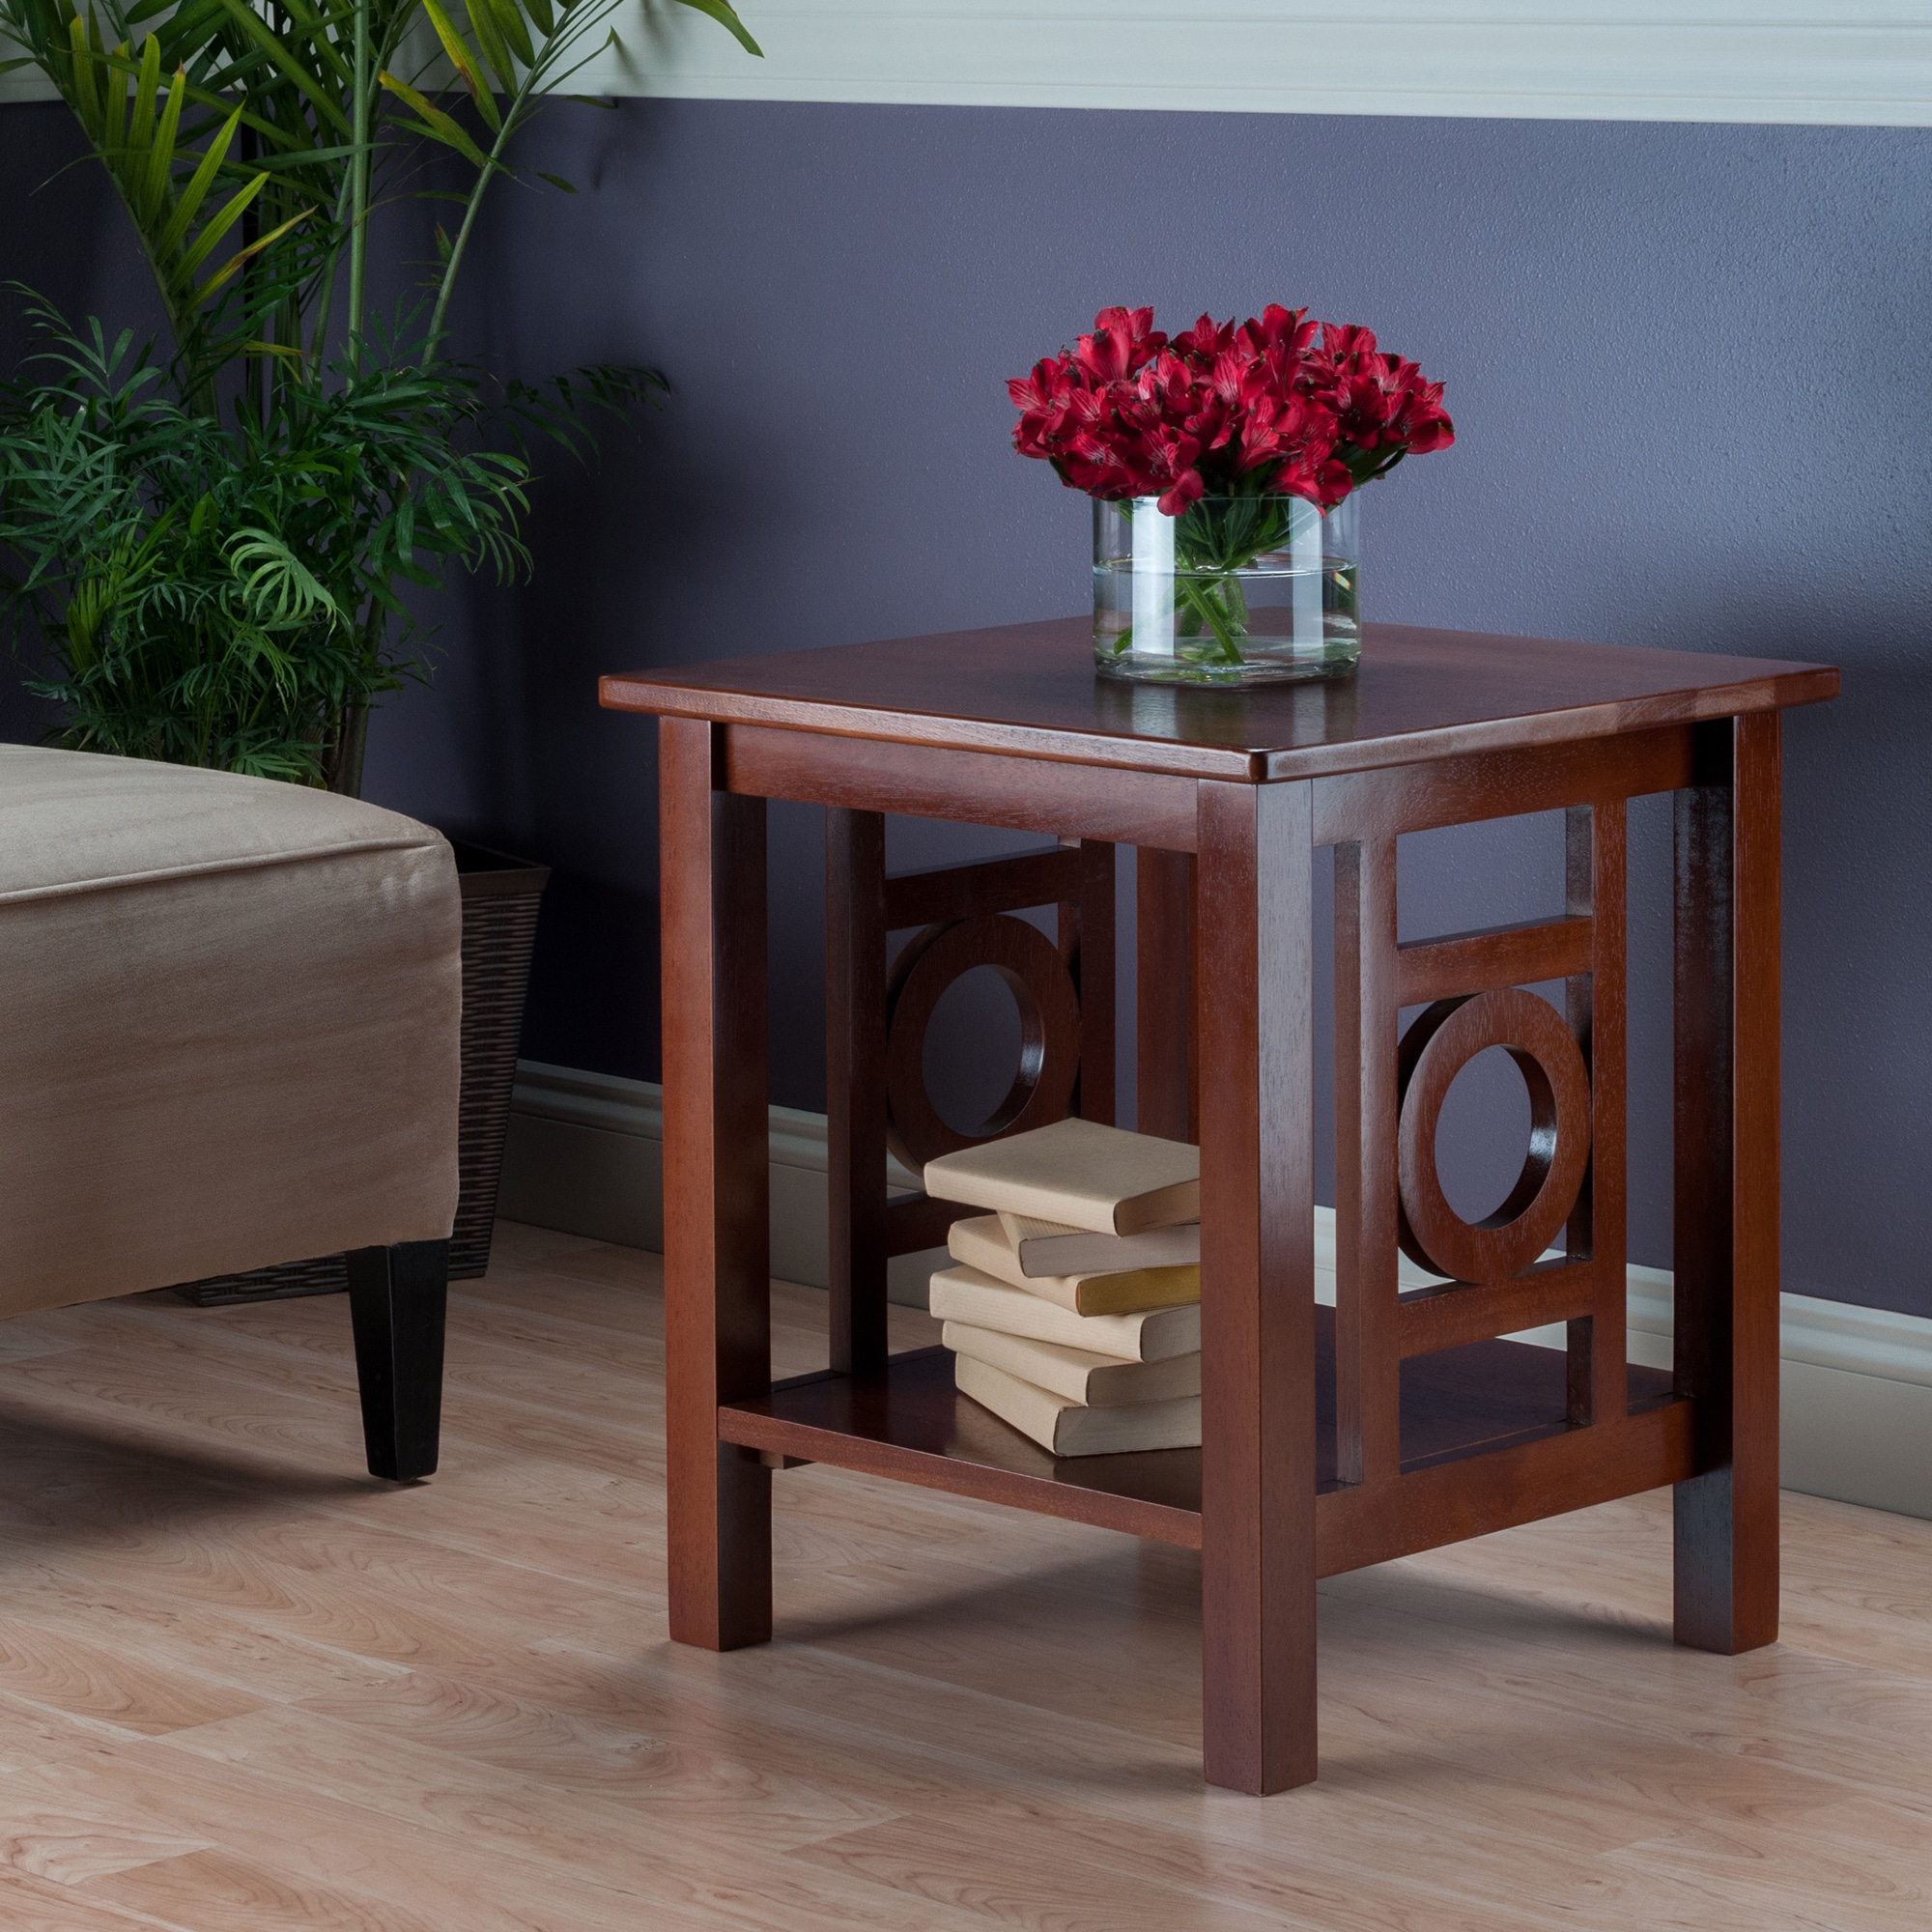 Strange Ollie End Table Walnut Ibusinesslaw Wood Chair Design Ideas Ibusinesslaworg